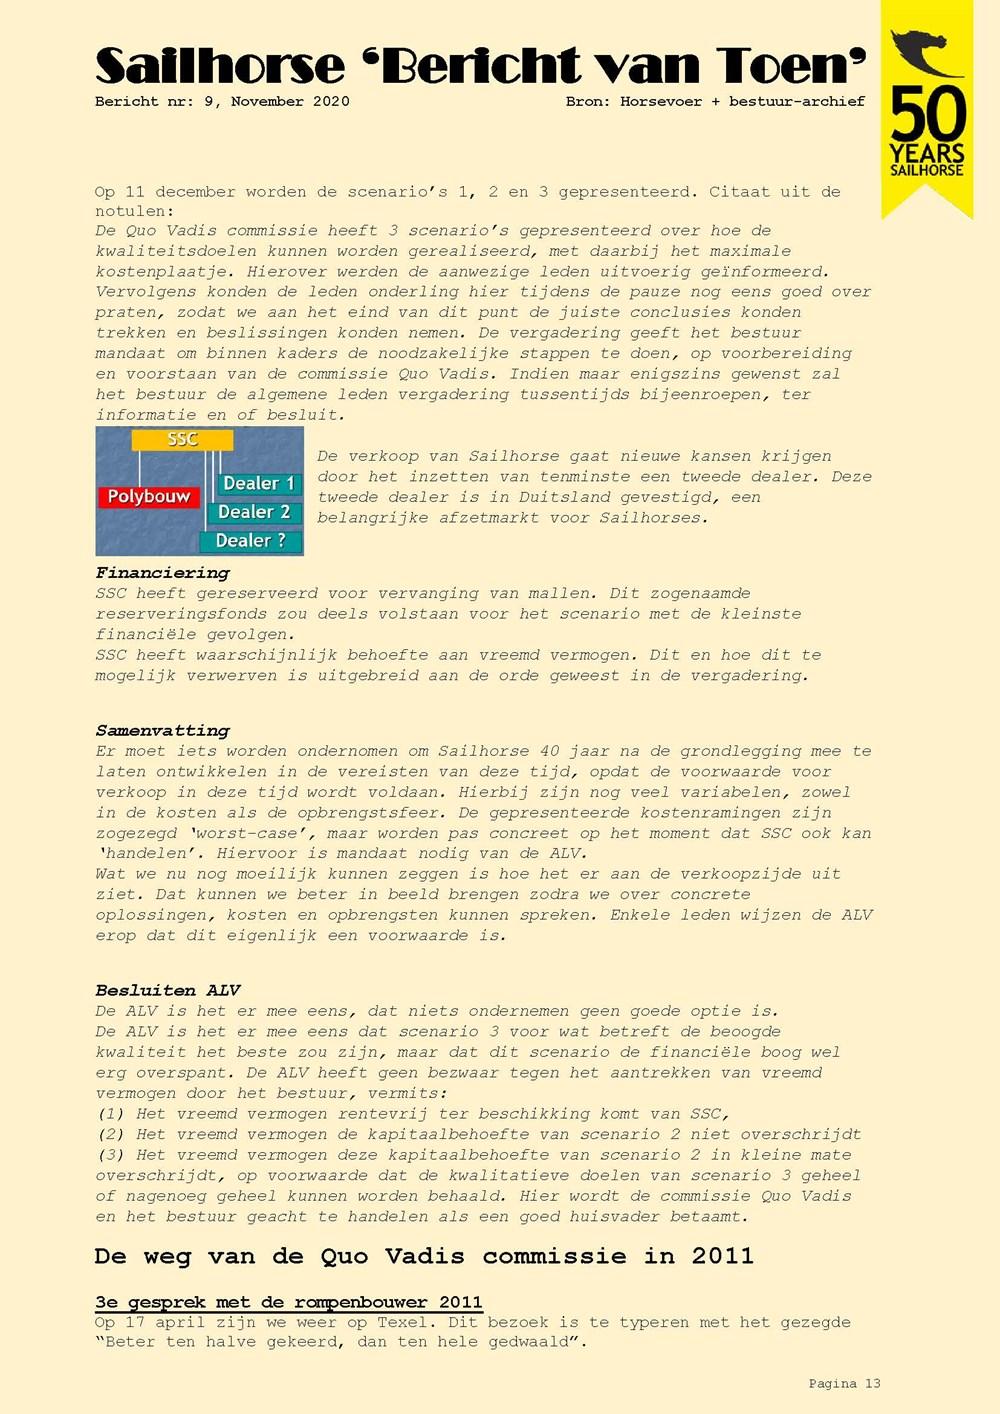 BvT09_Page_13.jpg